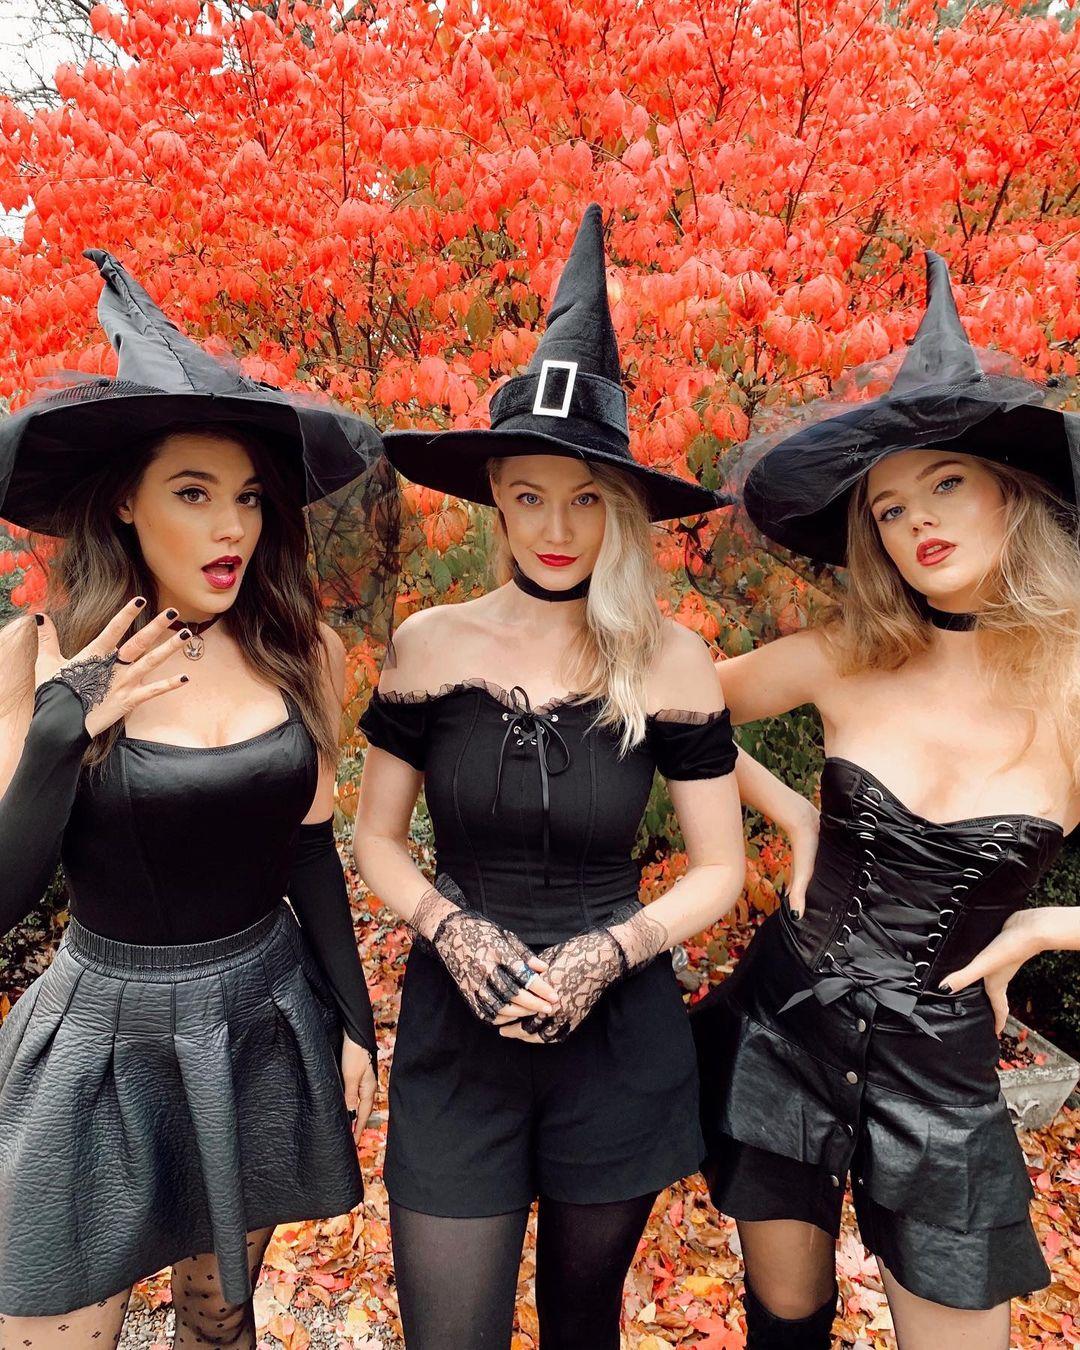 Trio witch Halloween costumes